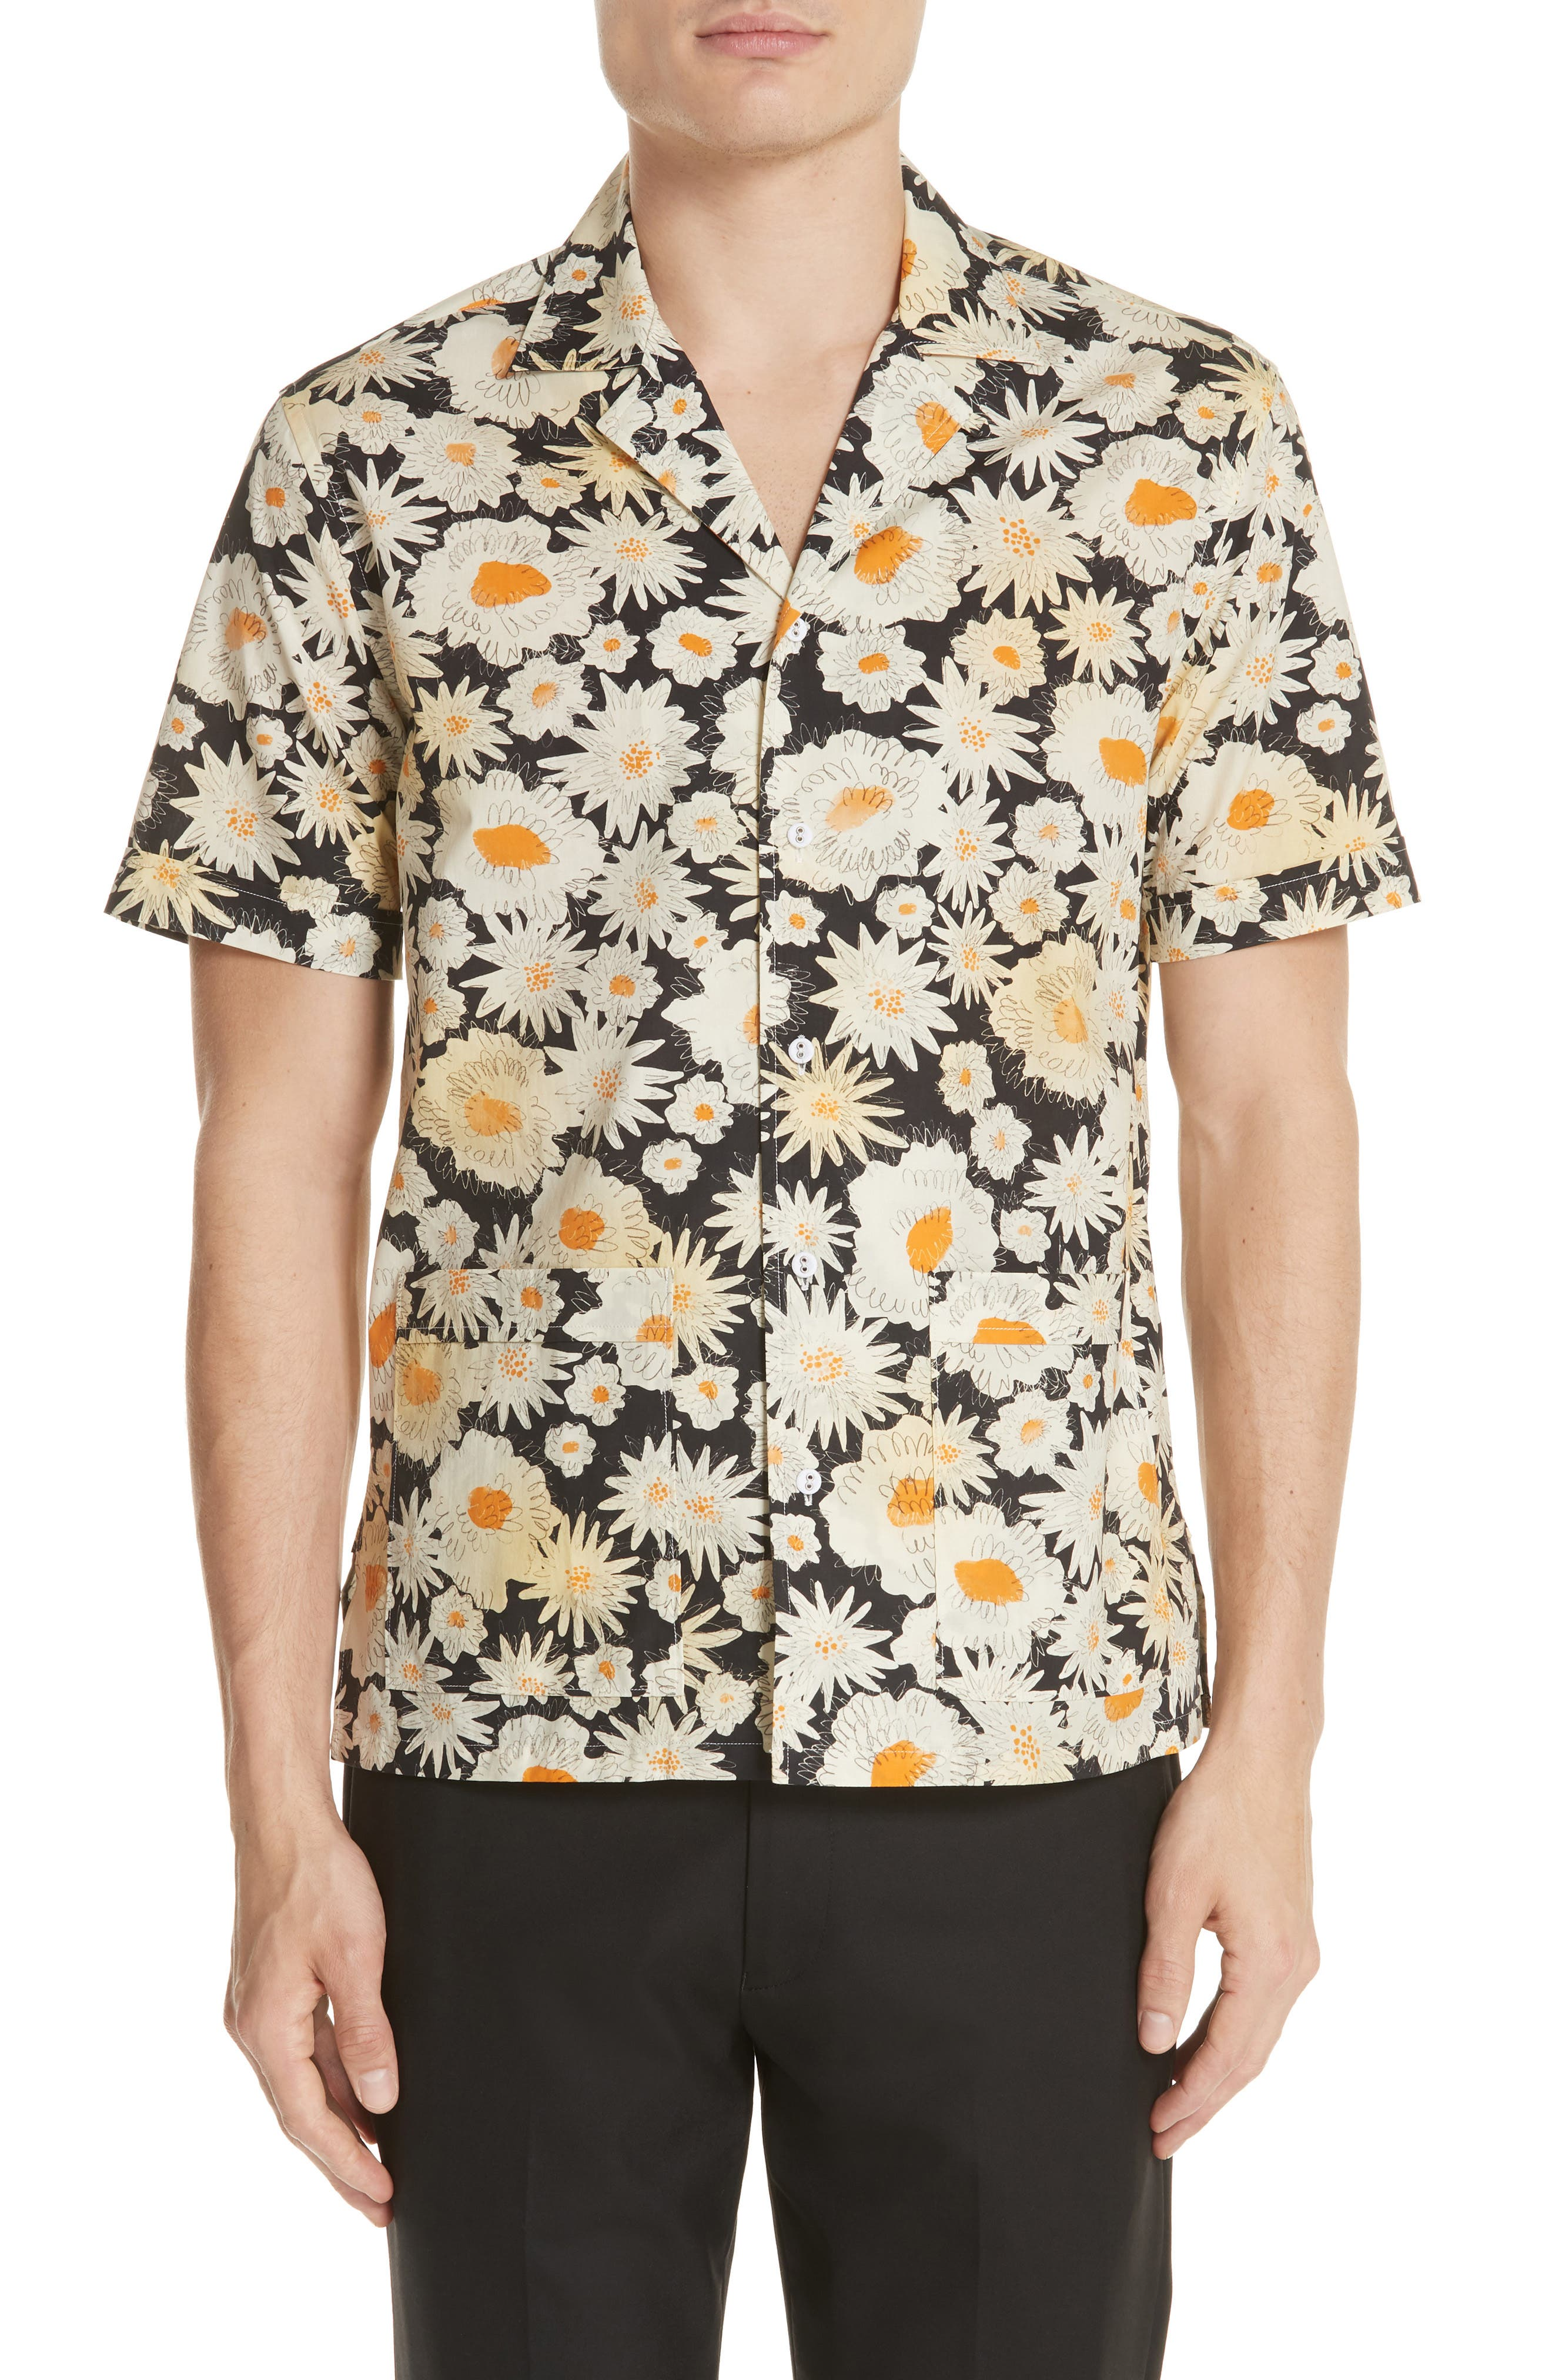 Burberry Jude Floral Print Shirt